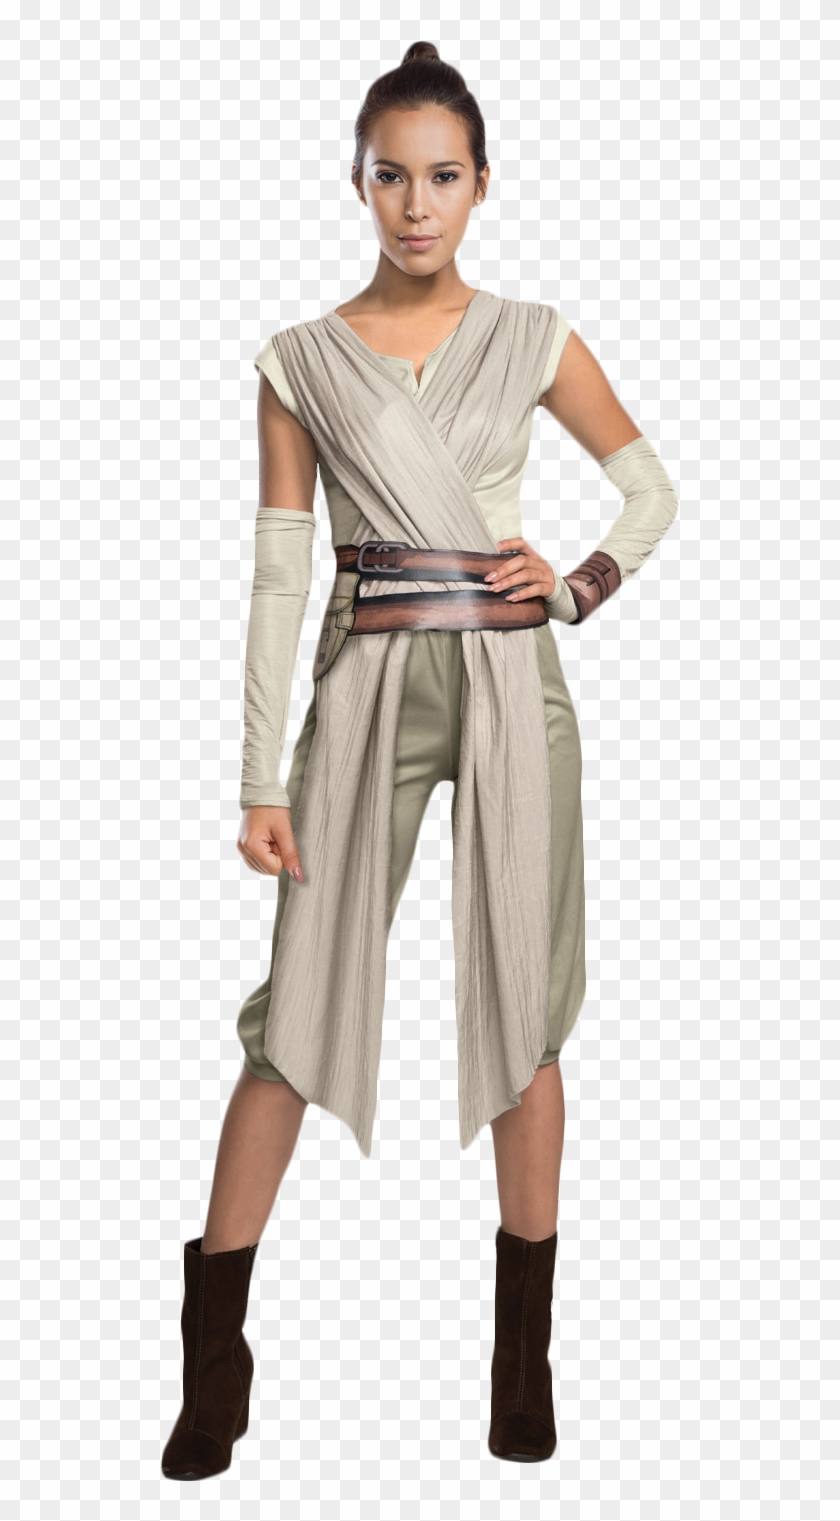 Anakin Skywalker Jedi Costumes Princess Leia Winter Costume